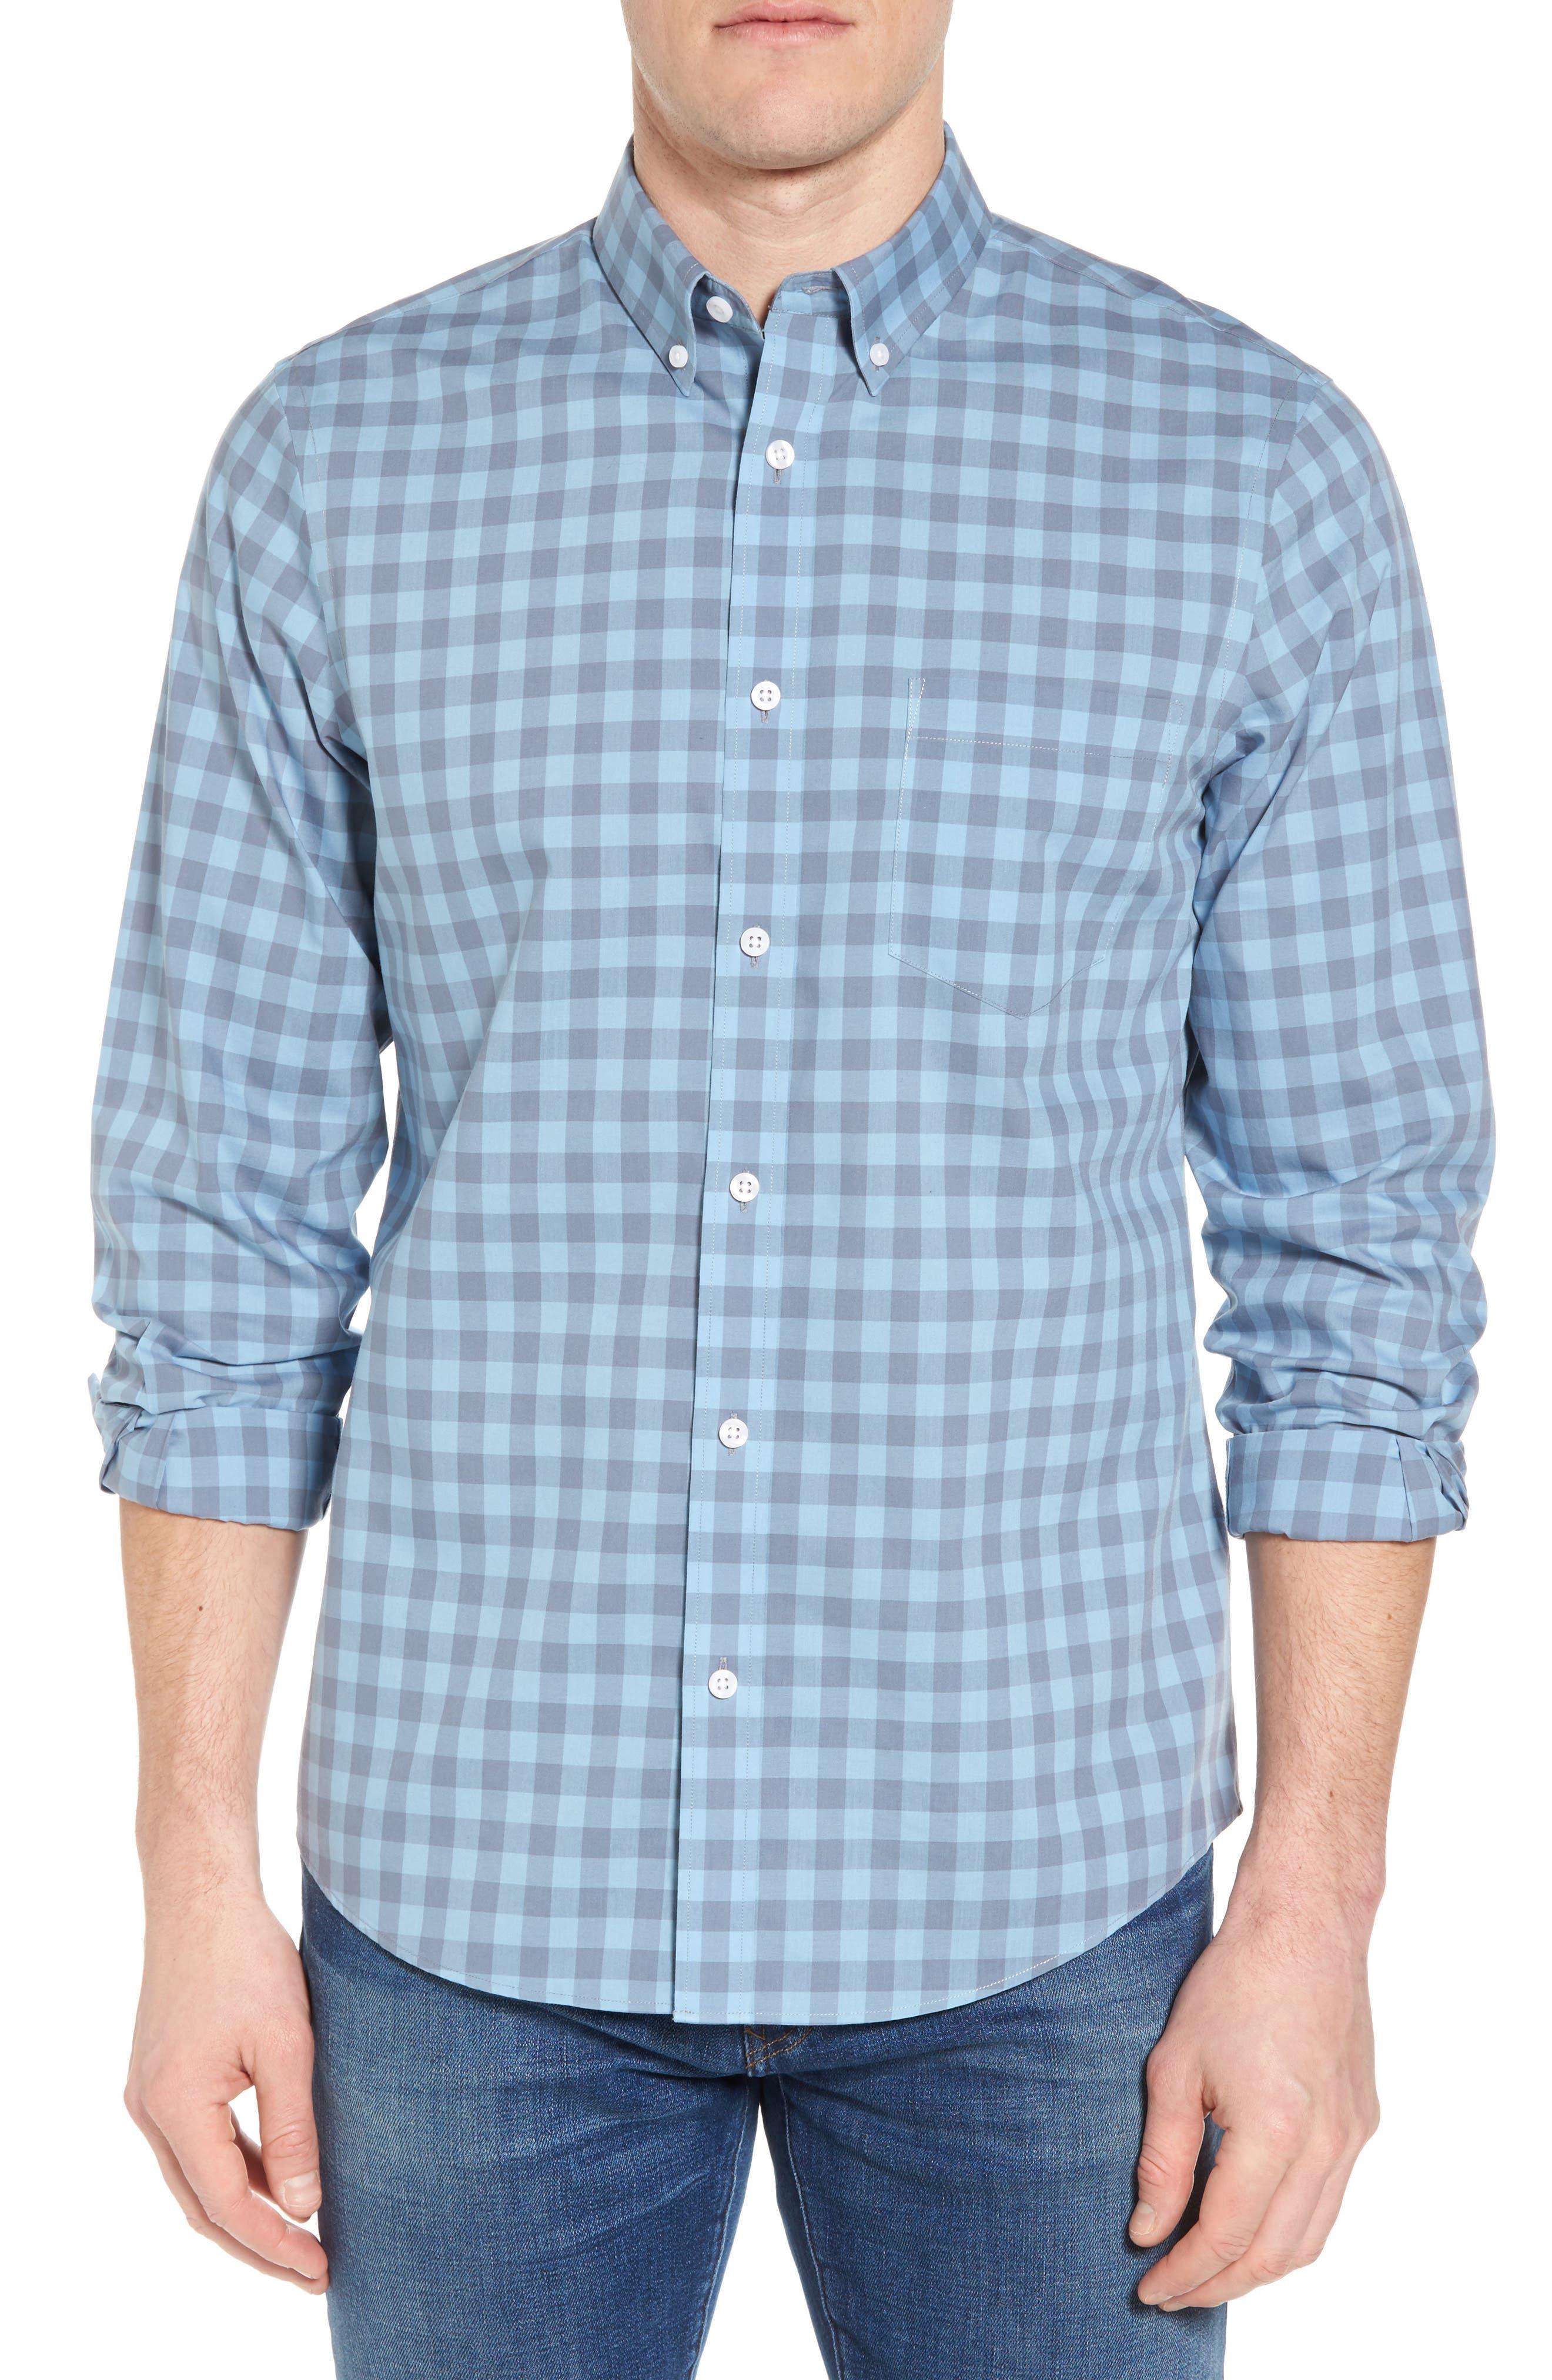 Regular Fit Gingham Sport Shirt,                             Main thumbnail 1, color,                             Blue Dusk Grey Gingham